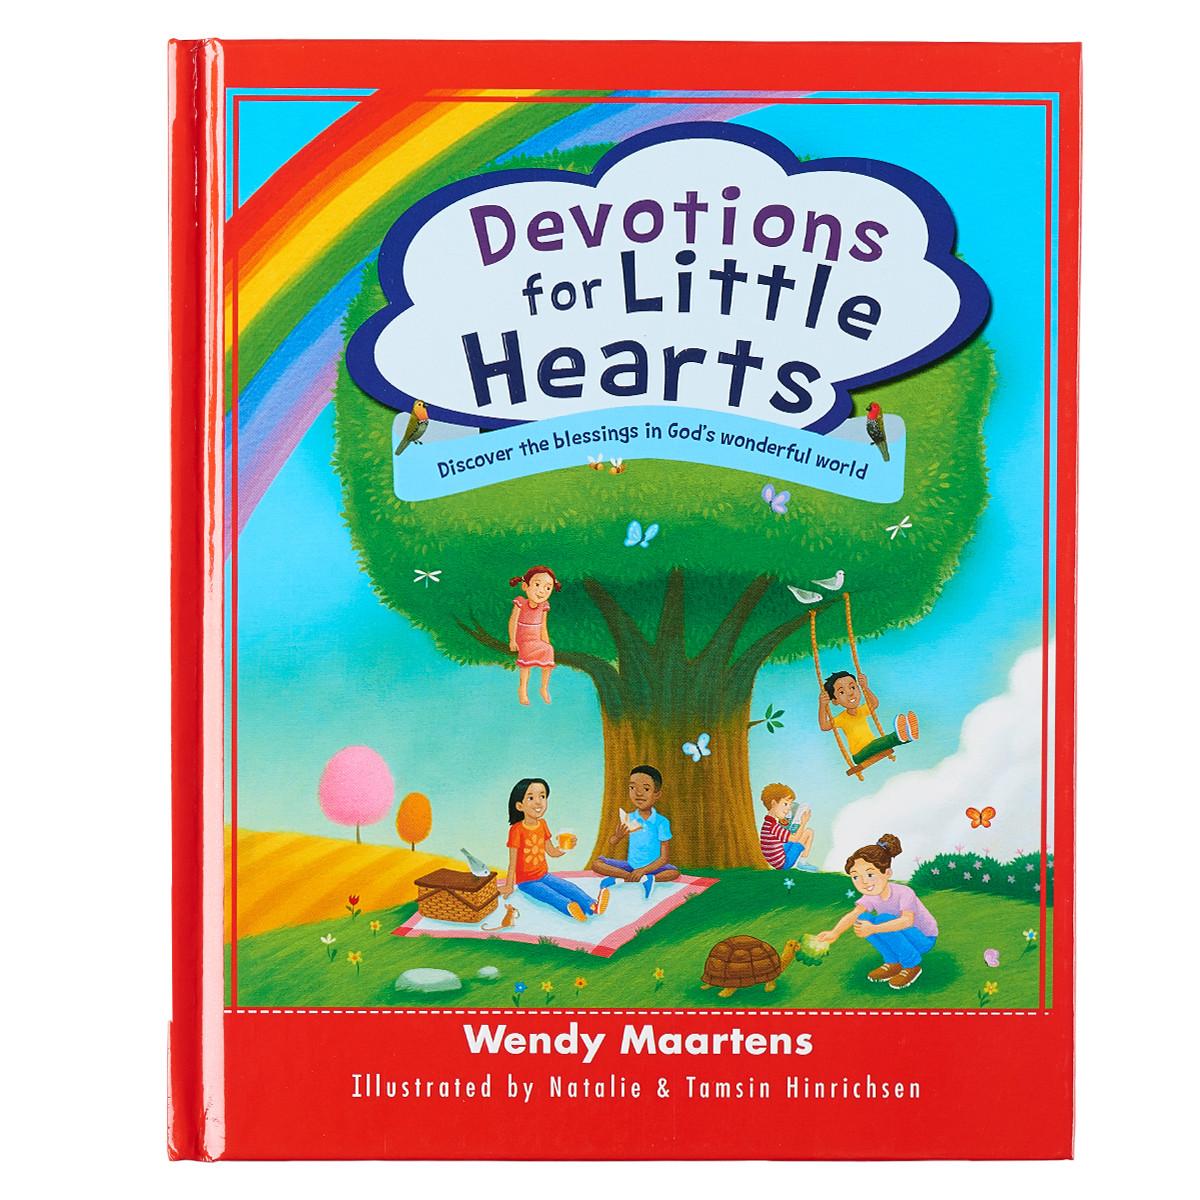 Devotions for Little Hearts KDS514, devotion book, childrens book, prayer book, childs gift, prayer gift